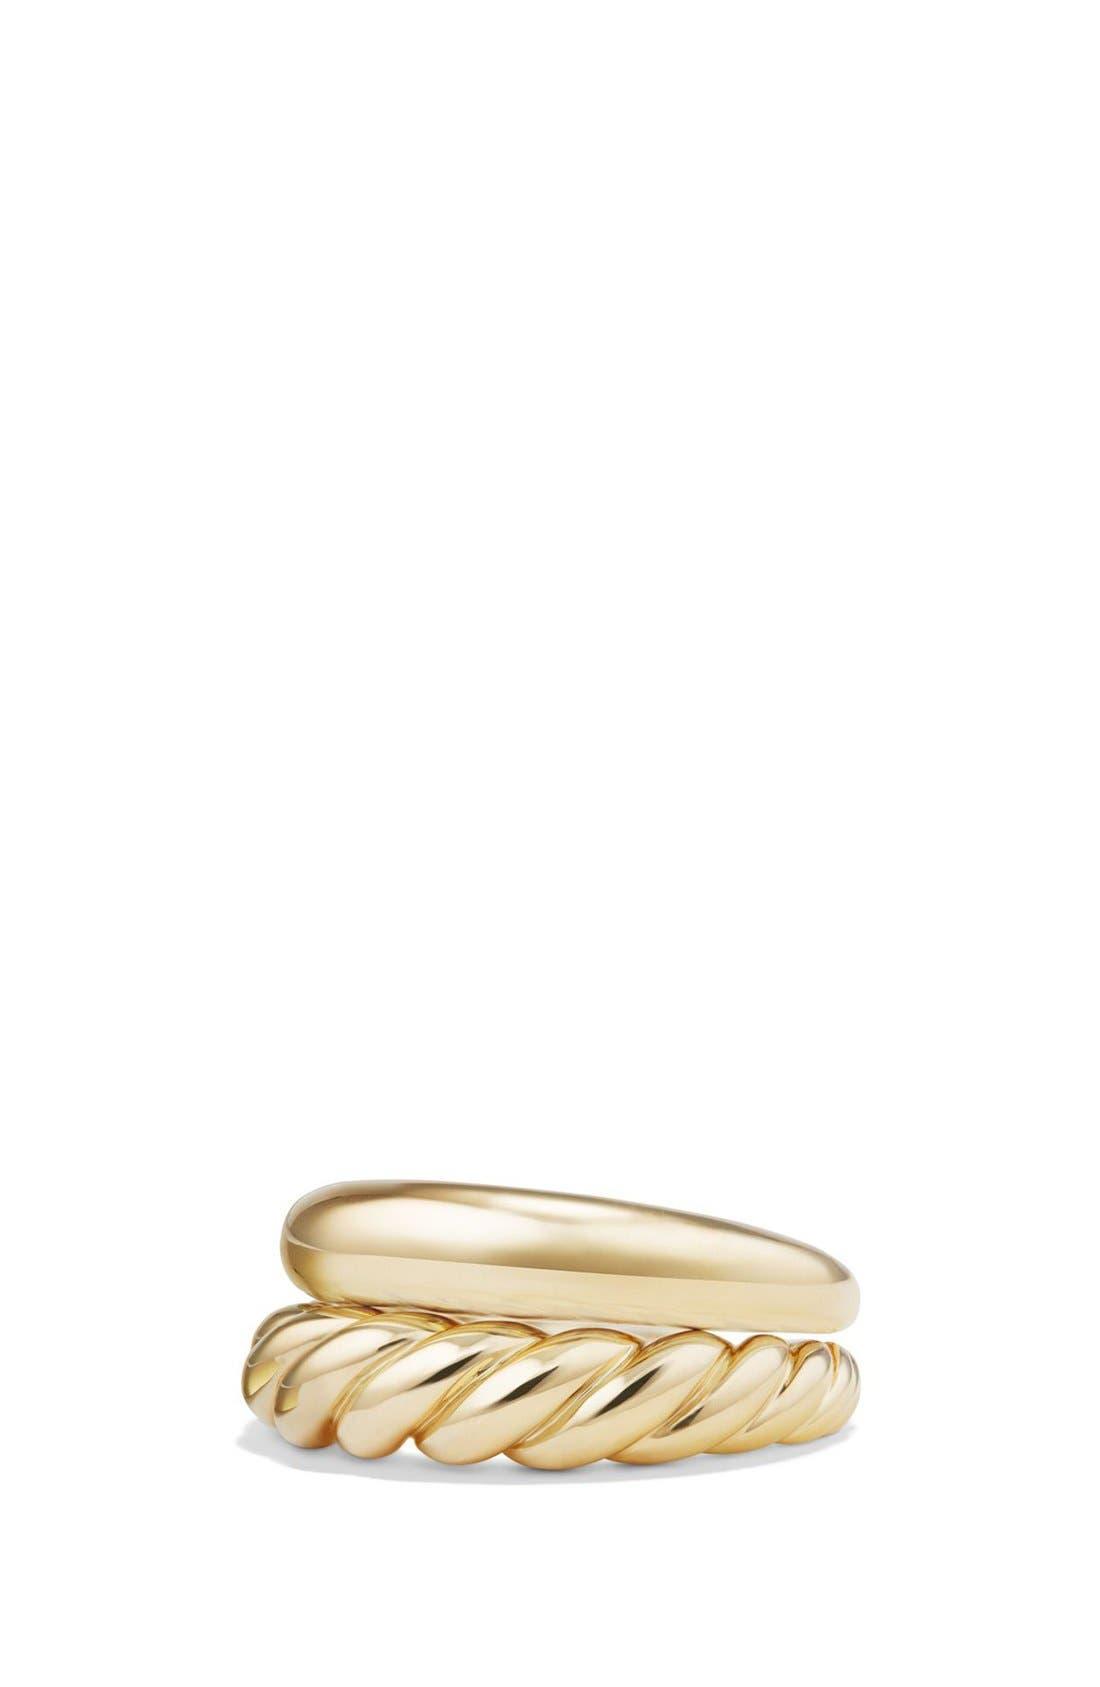 DAVID YURMAN Pure Form Stack Rings in 18K Gold